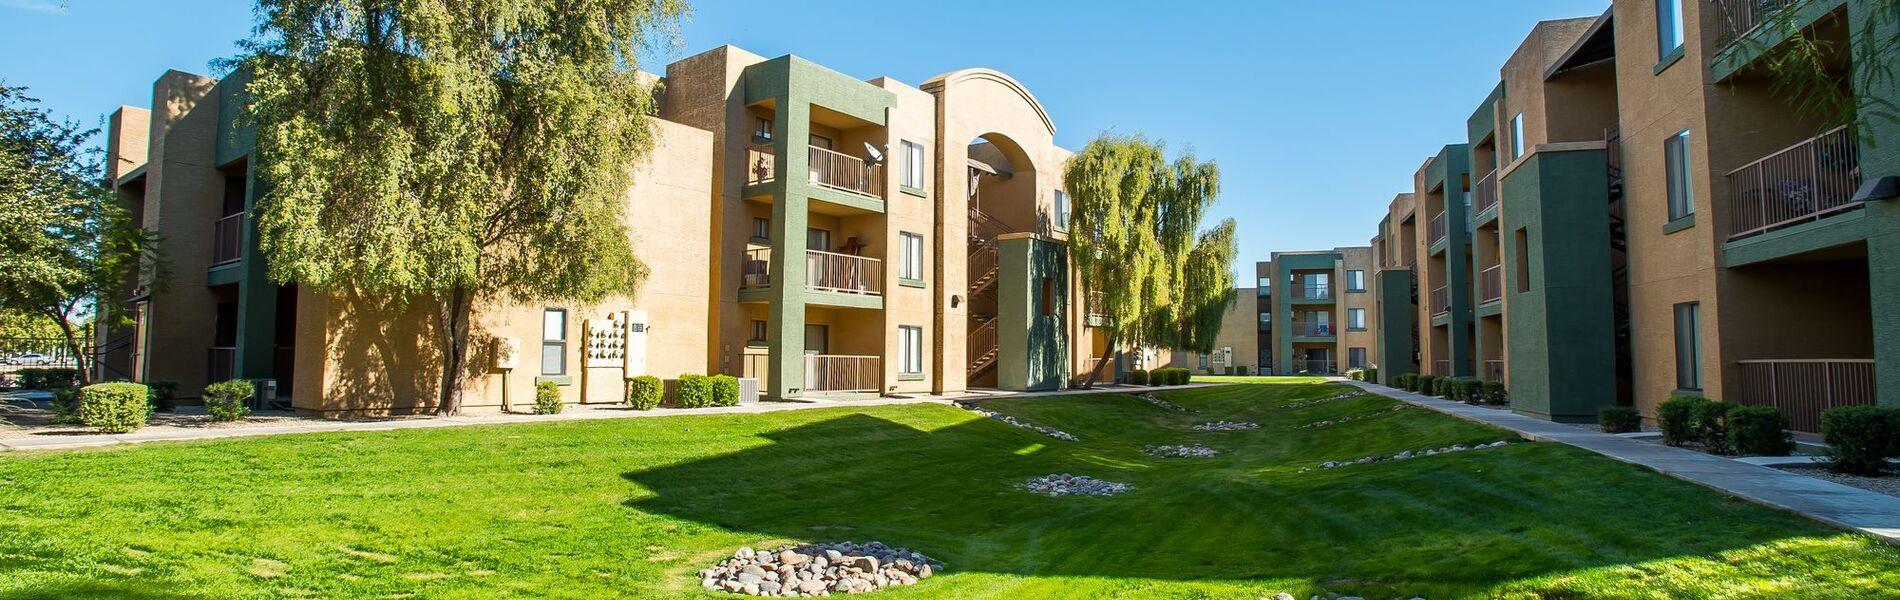 apartments in phoenix near asu esteban park